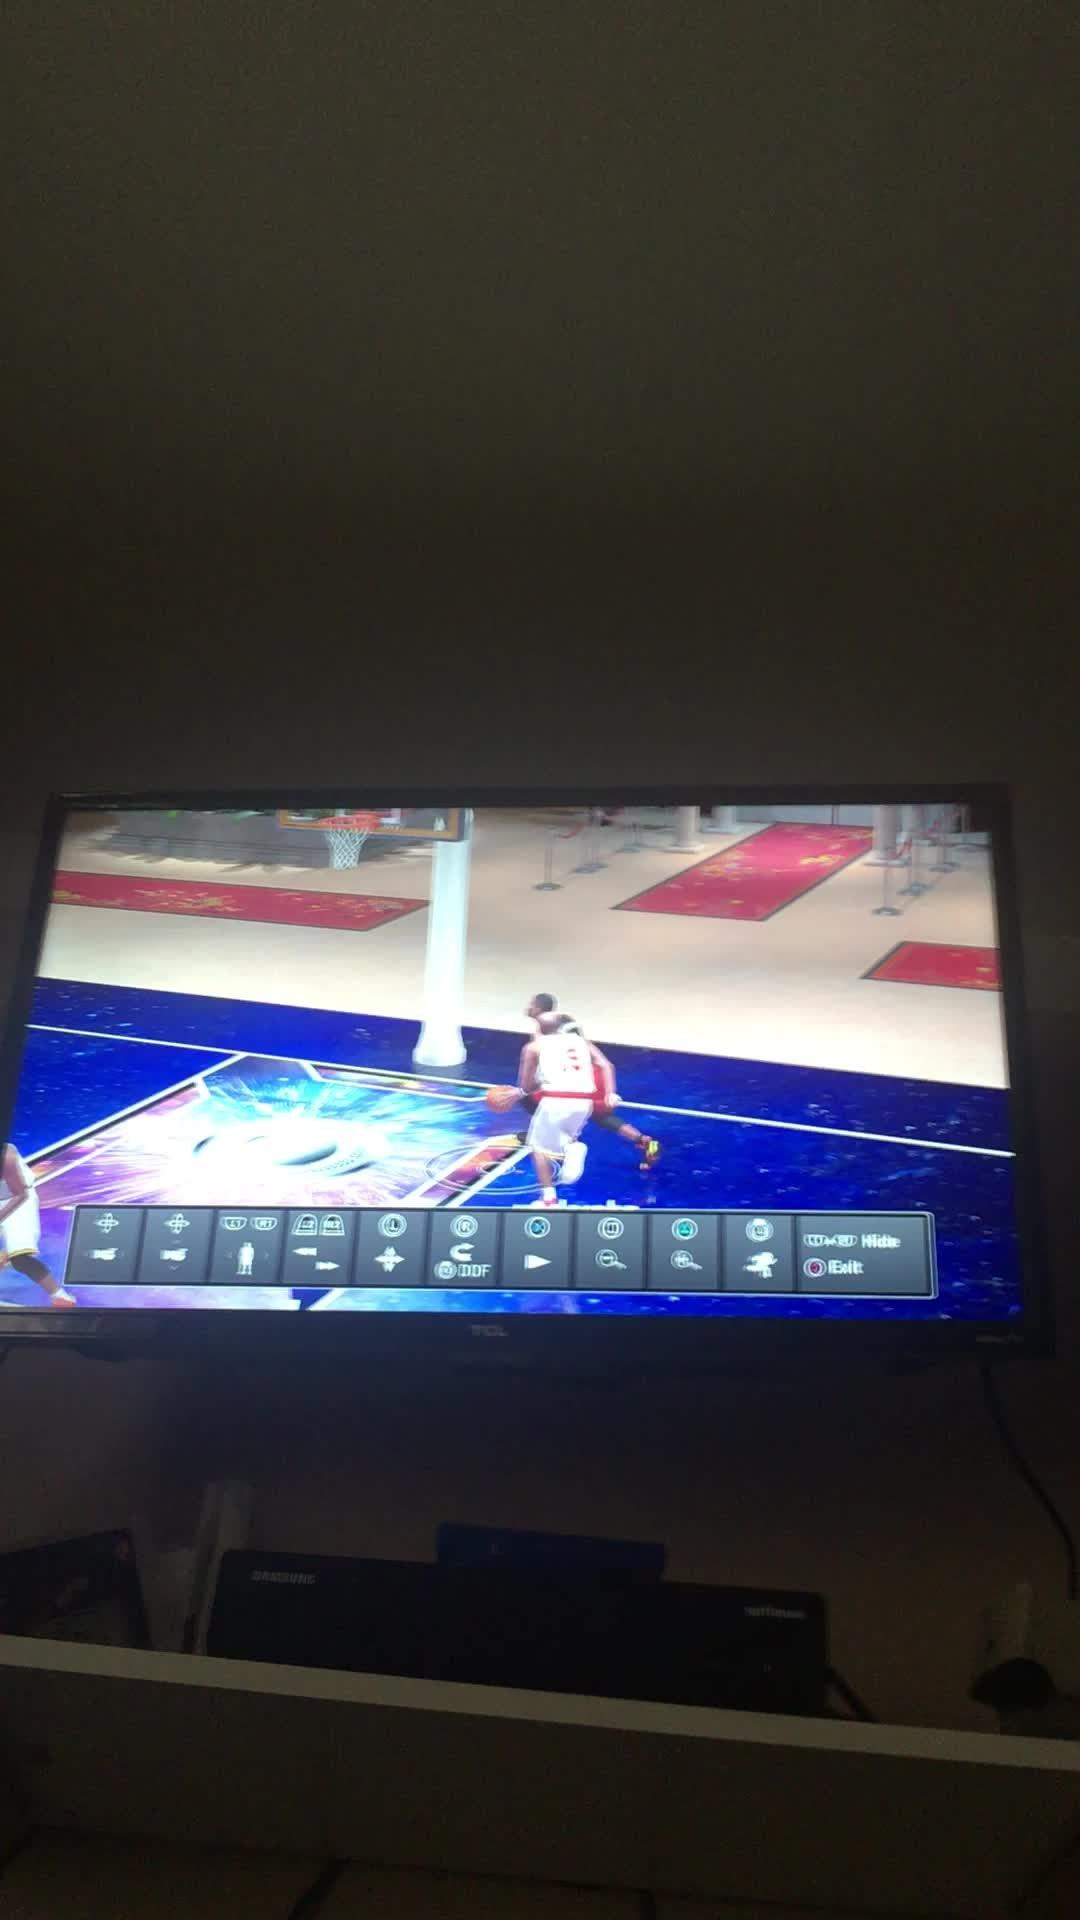 NBA 2K: General - Russell Westbrook slam video cover image 0